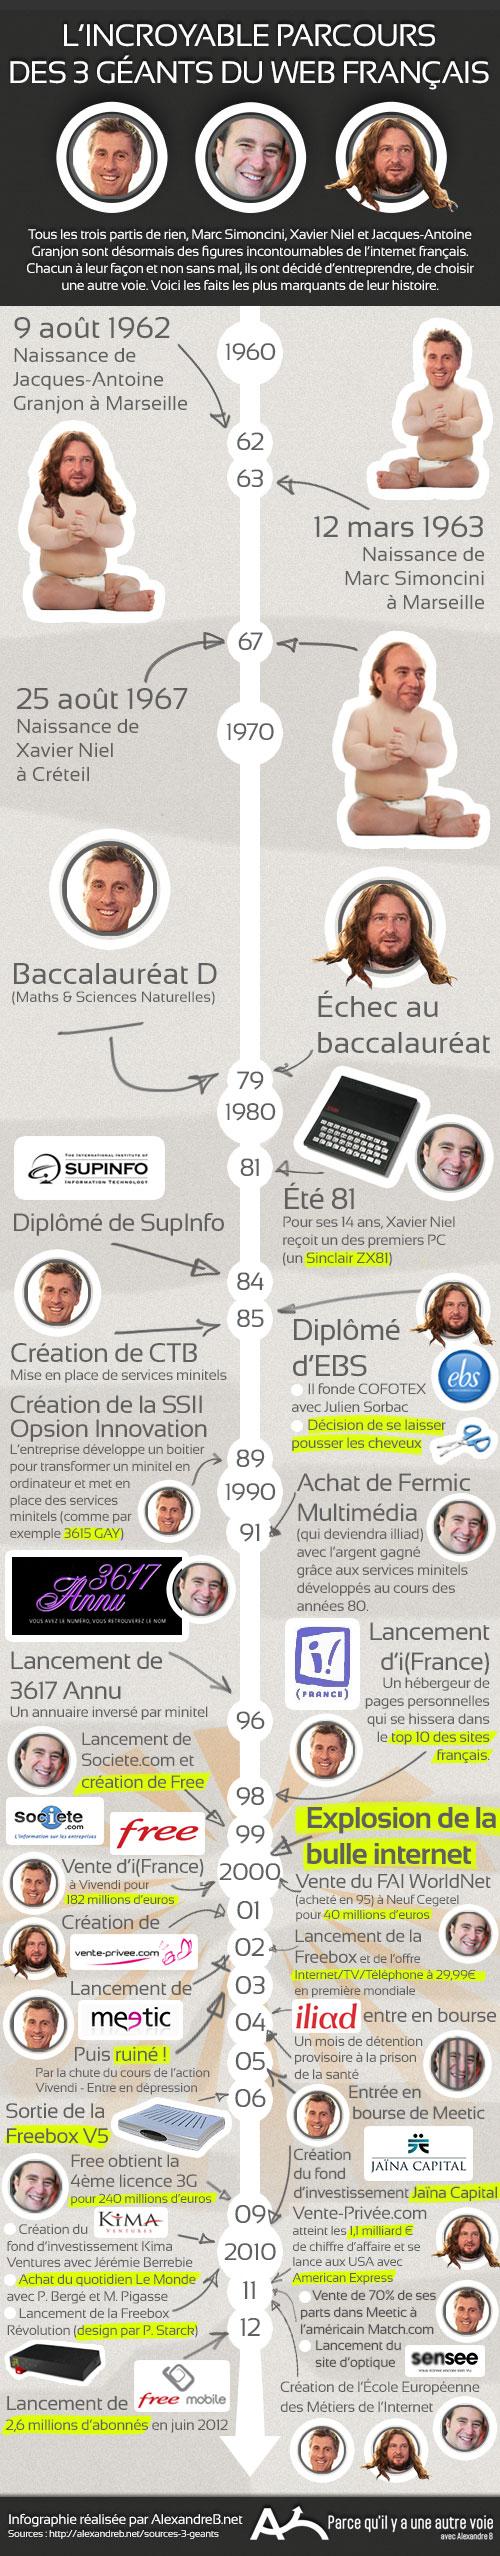 Infographie parcours Simoncini Niel Granjon